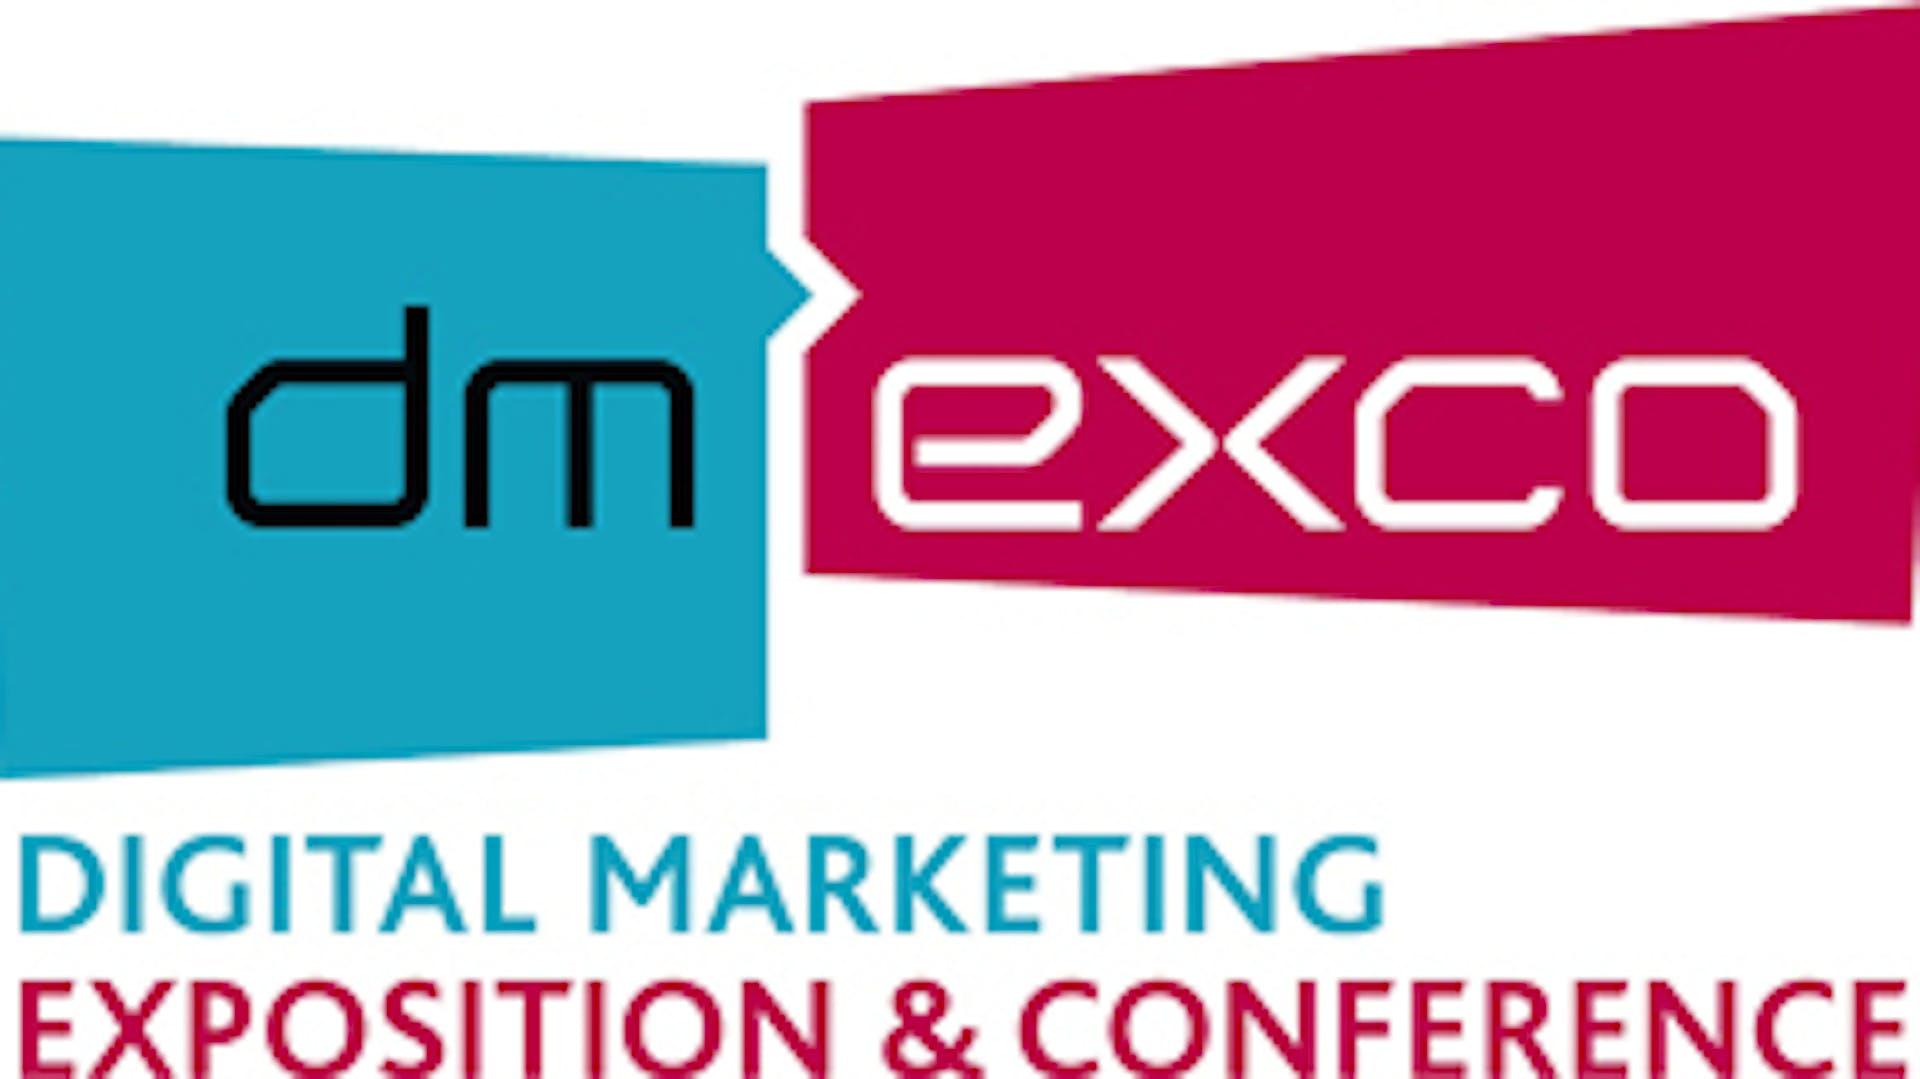 dmexco 2016 2017 logo